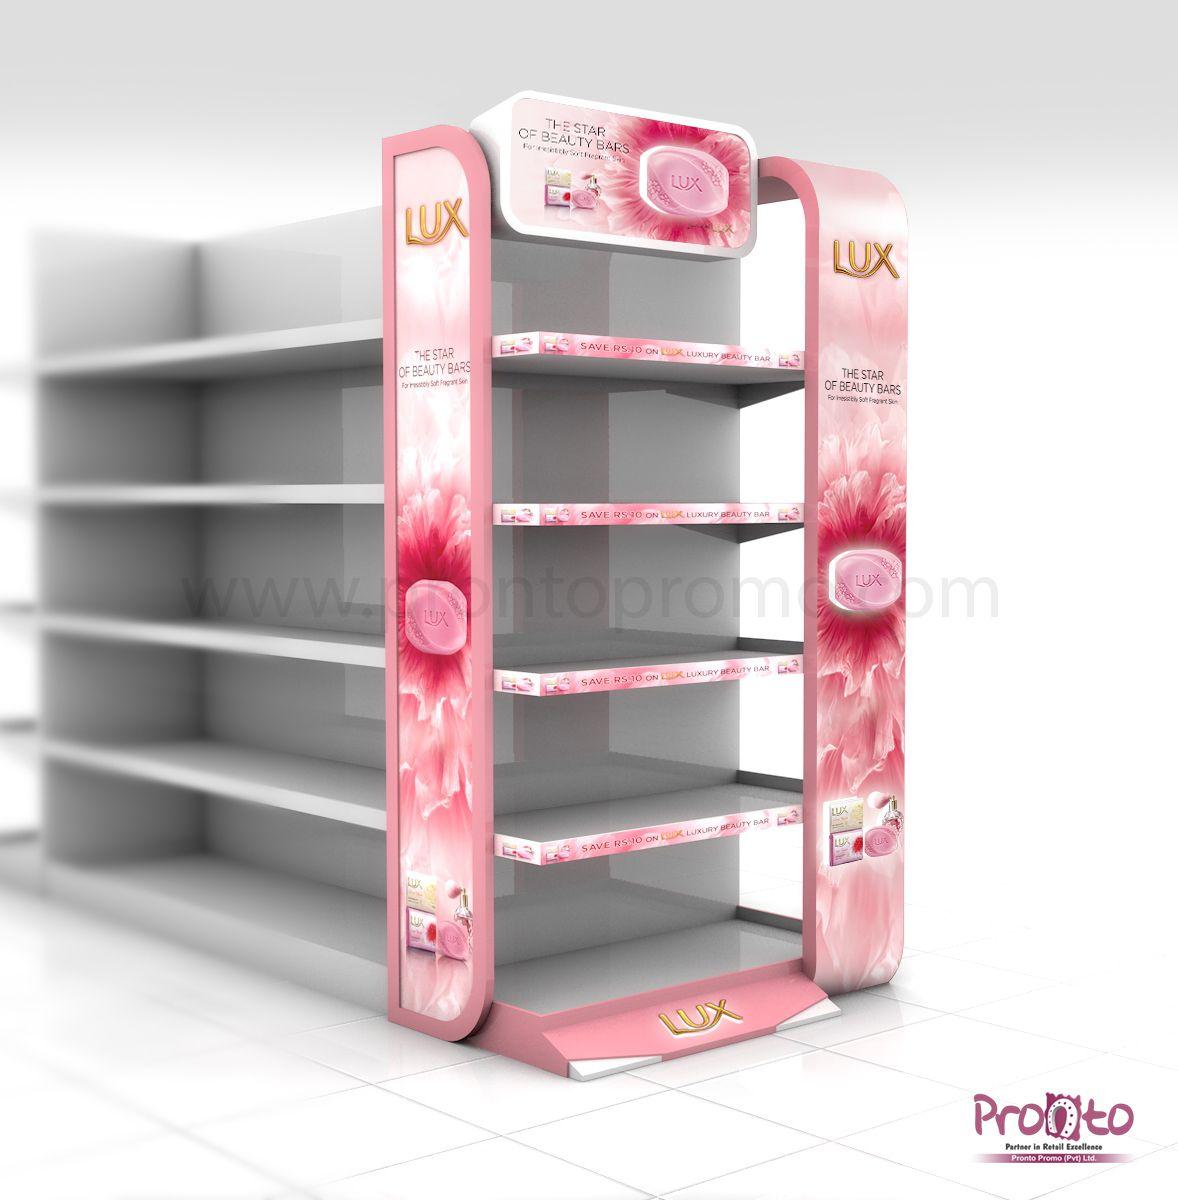 Lux Soap Display Podium Gondola S Hanging Display Design Concept  # Muebles Martinez Y Riquelme